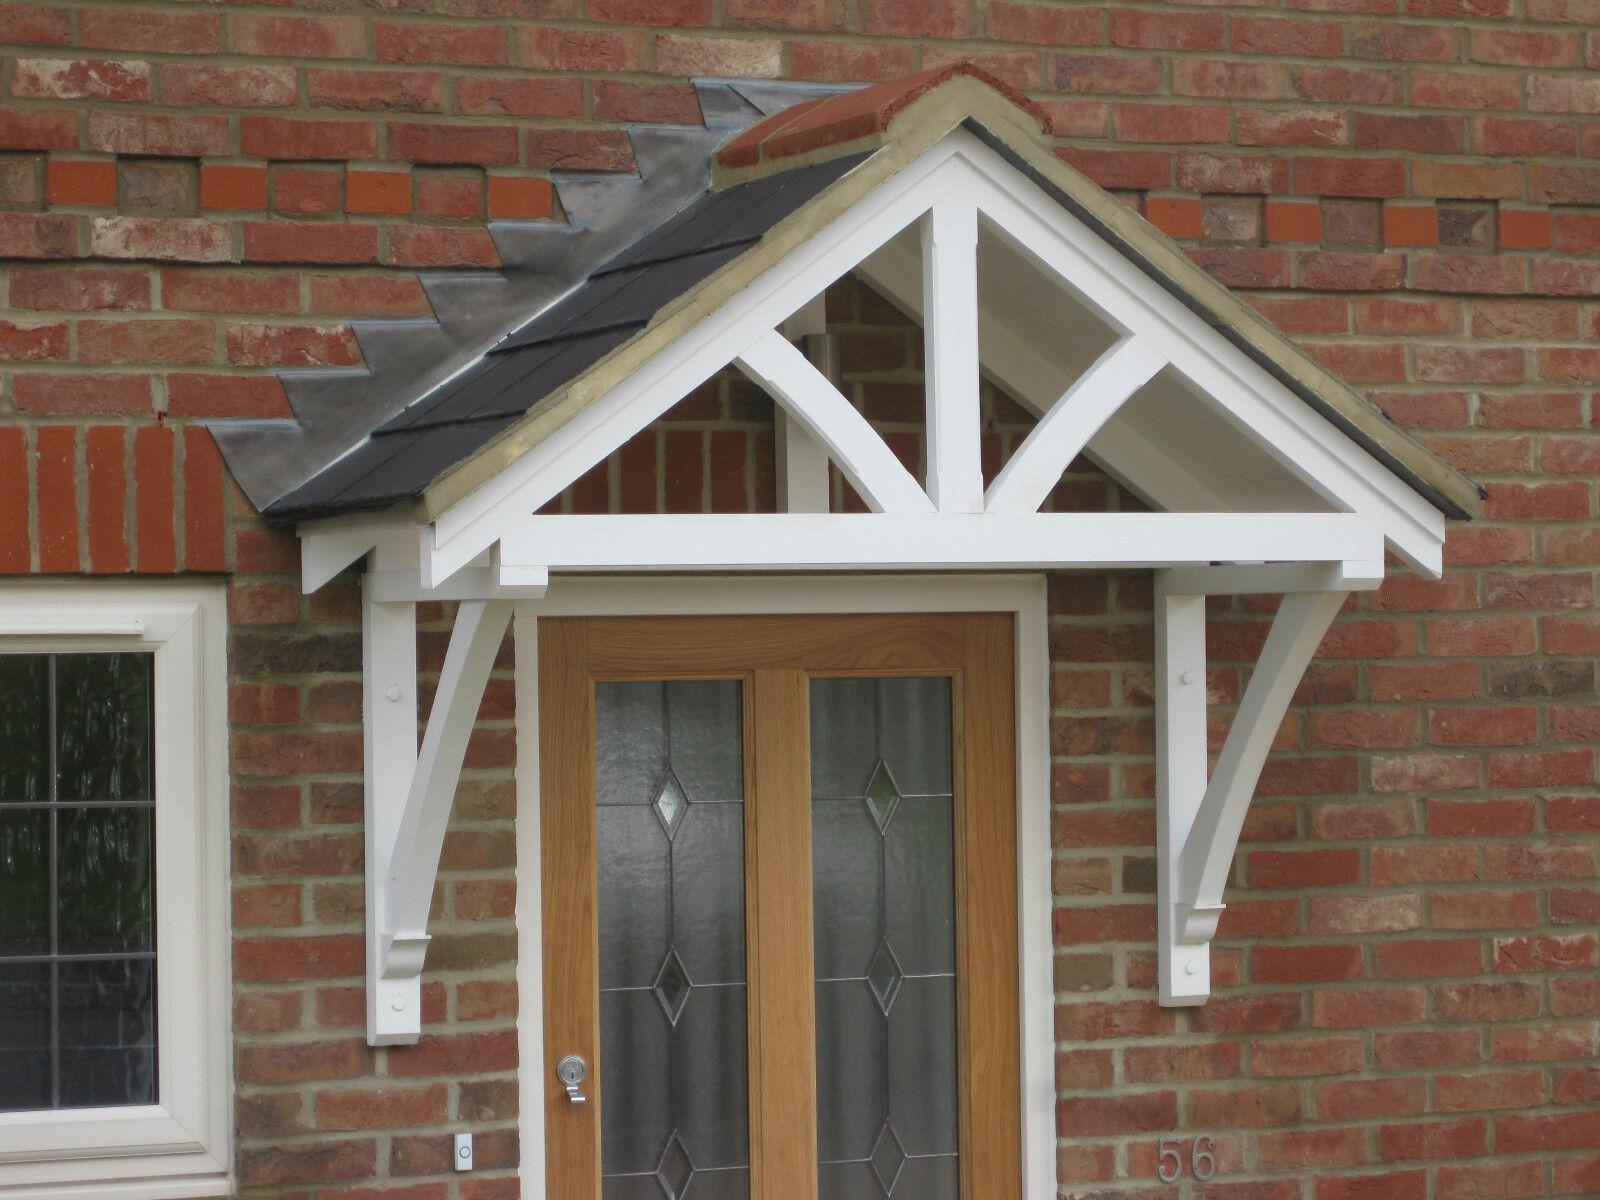 door canopy designs timber entrance porch canopy door. Black Bedroom Furniture Sets. Home Design Ideas